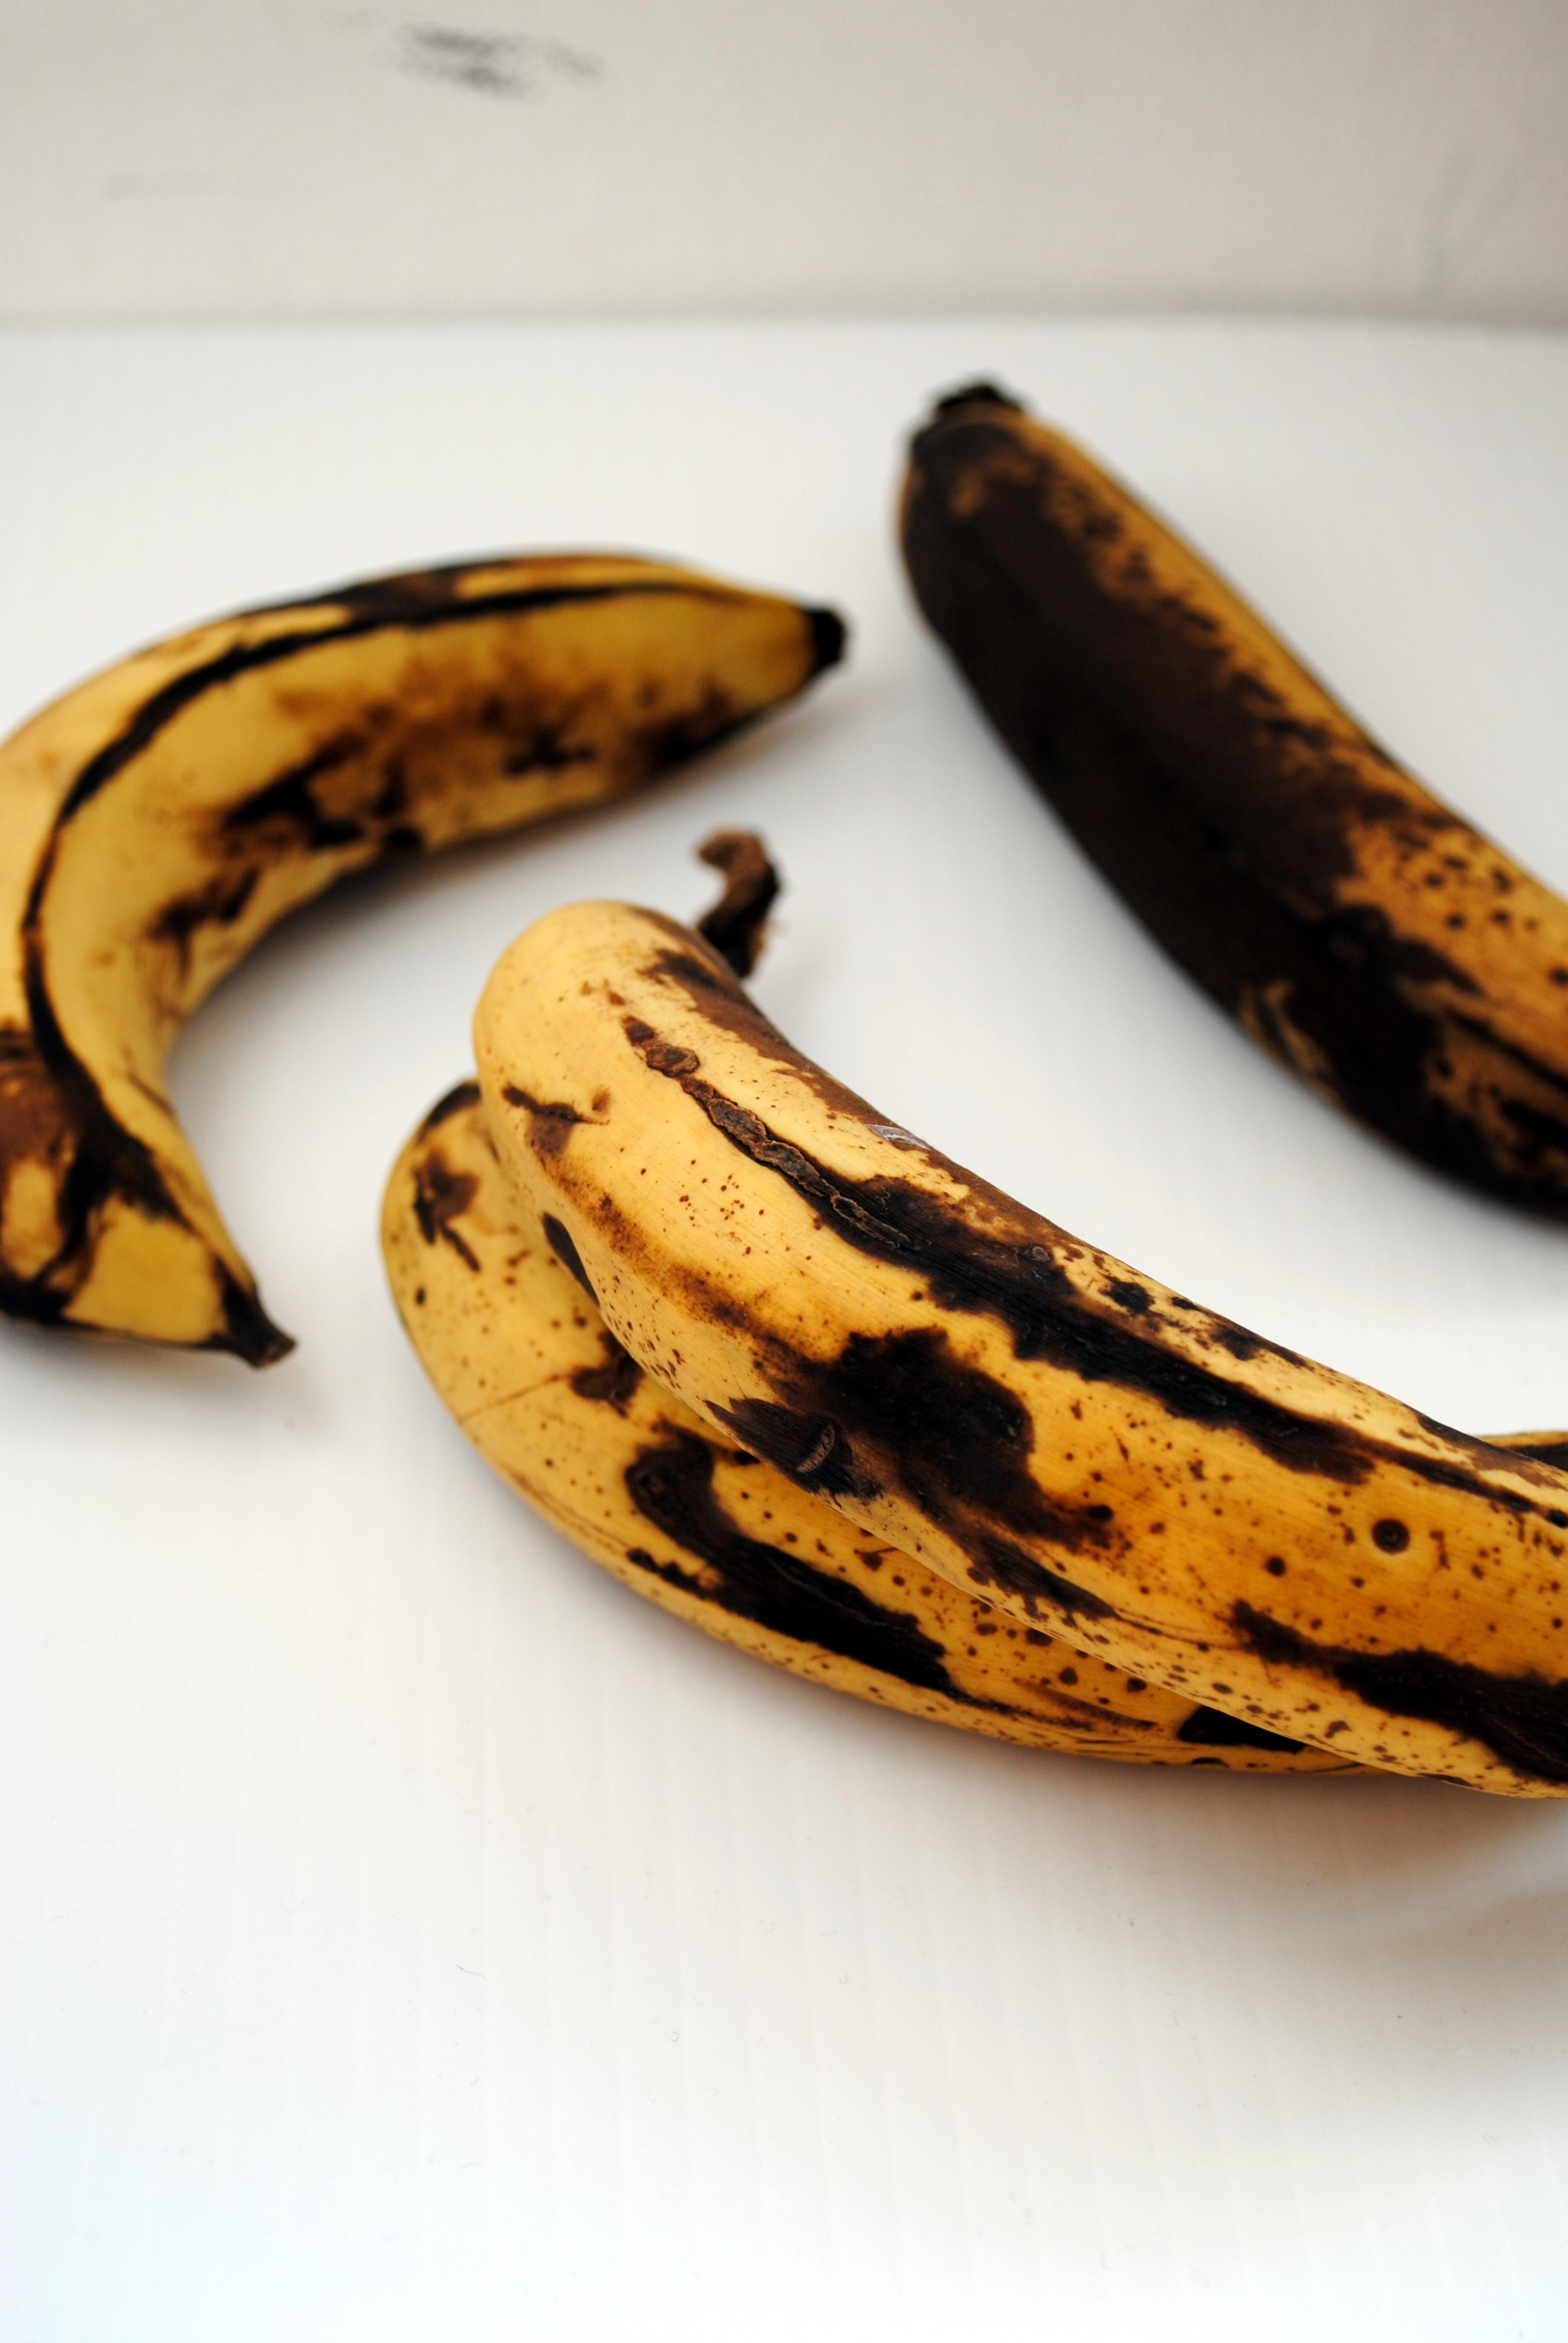 What Are Banana Plant Pups How To Separate Banana Tree: Over-Ripe Banana Heaven